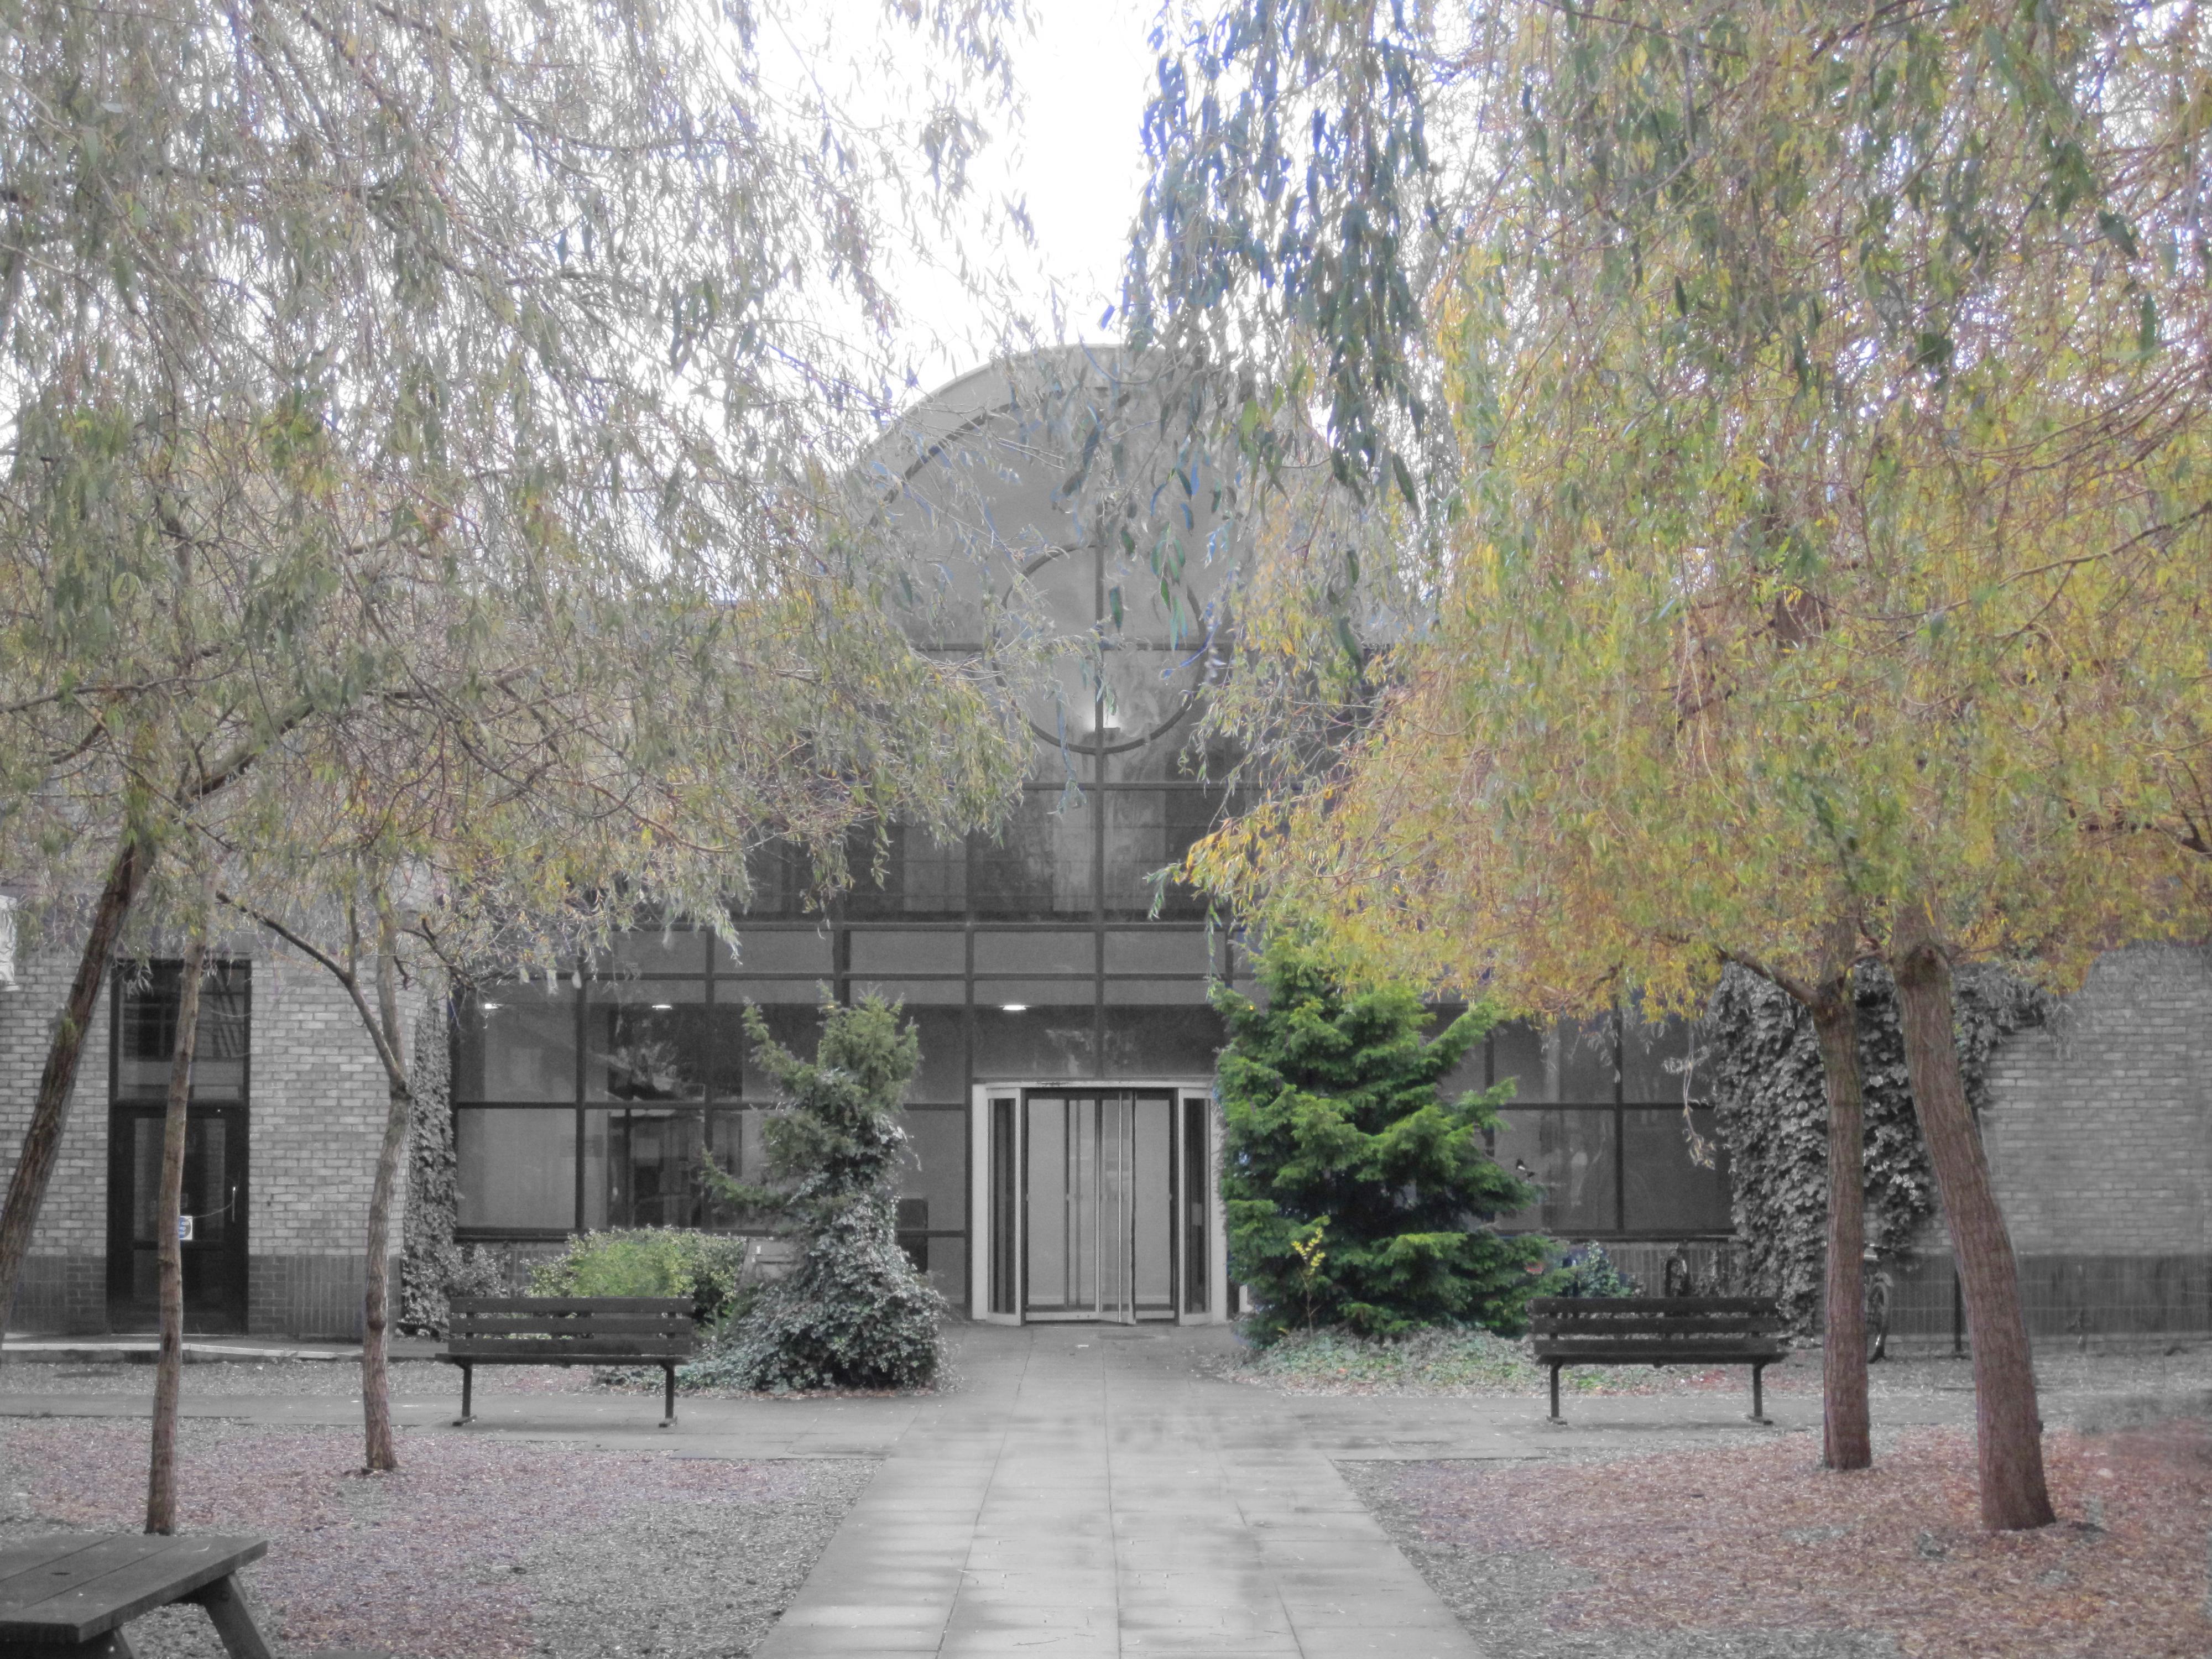 Qiagen Laboratories